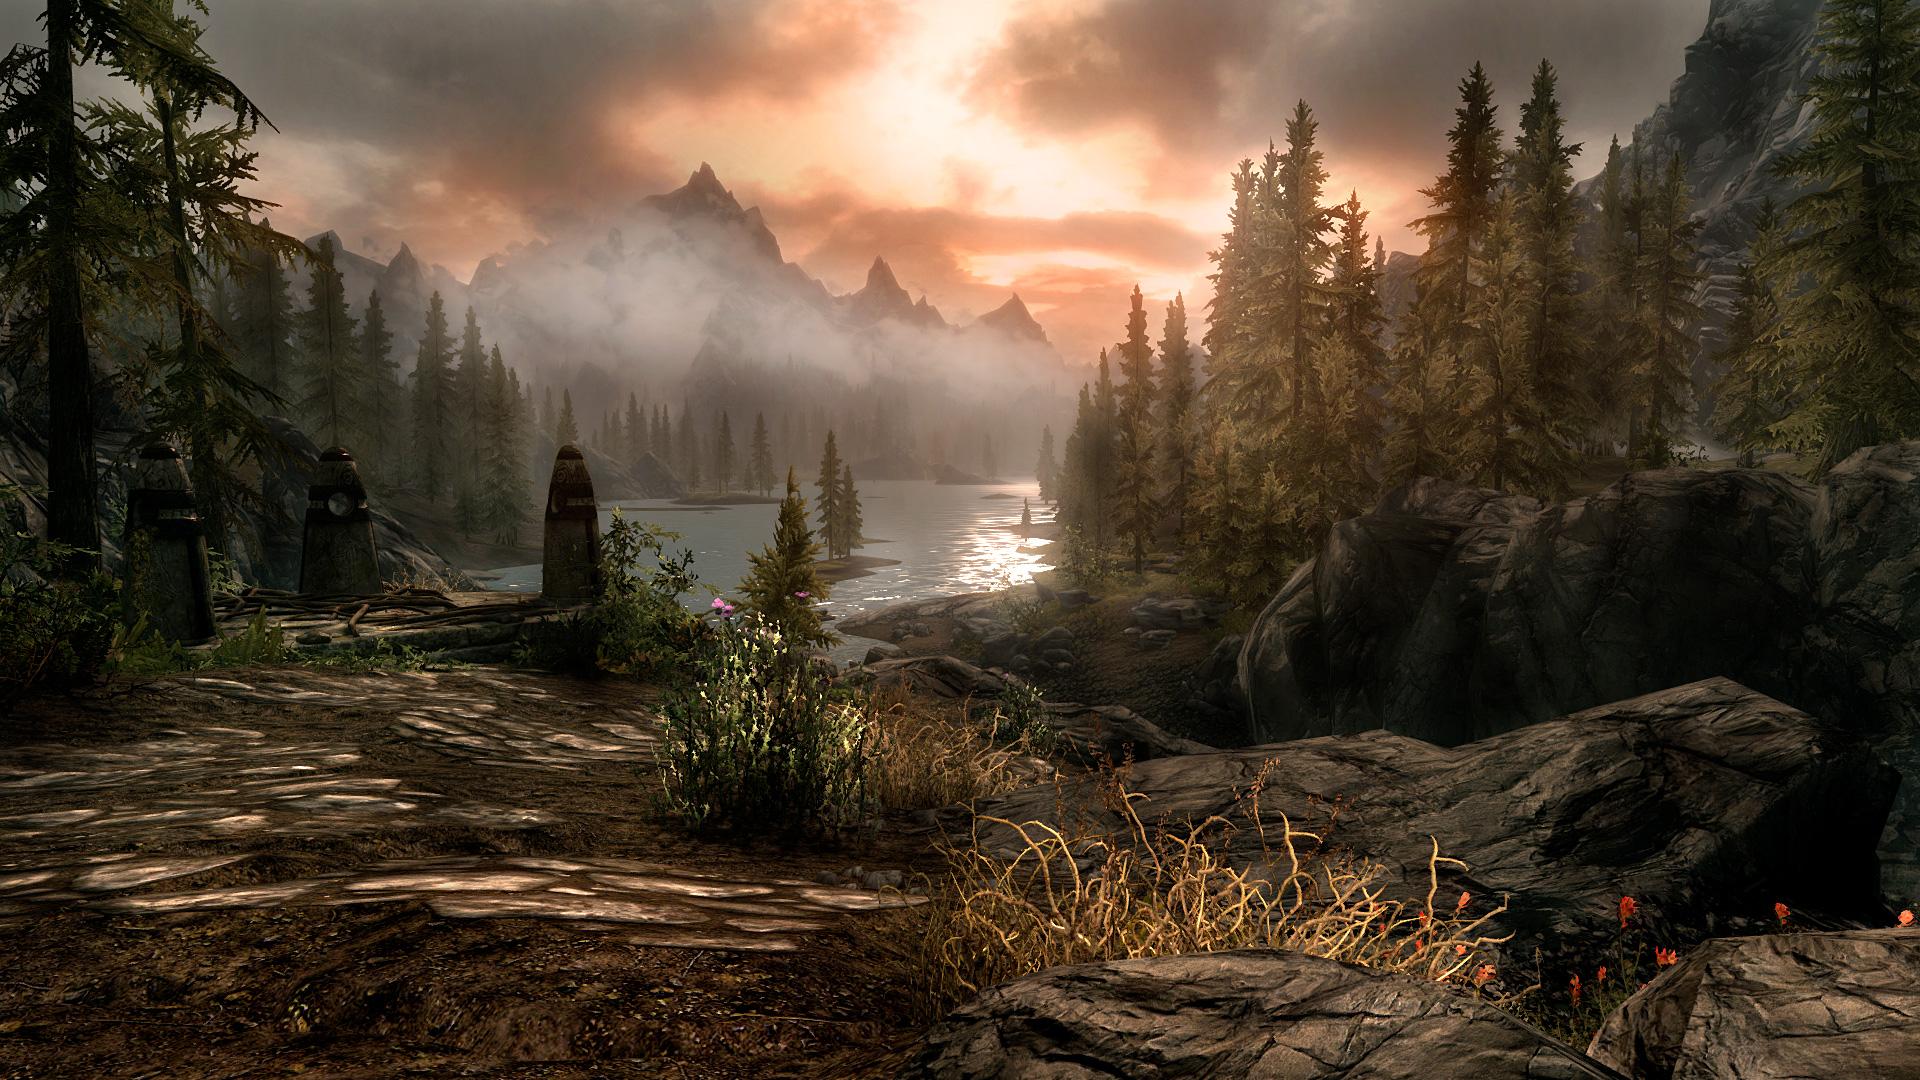 The Elder Scrolls V: Skyrim HD Wallpapers Backgrounds 1920x1080